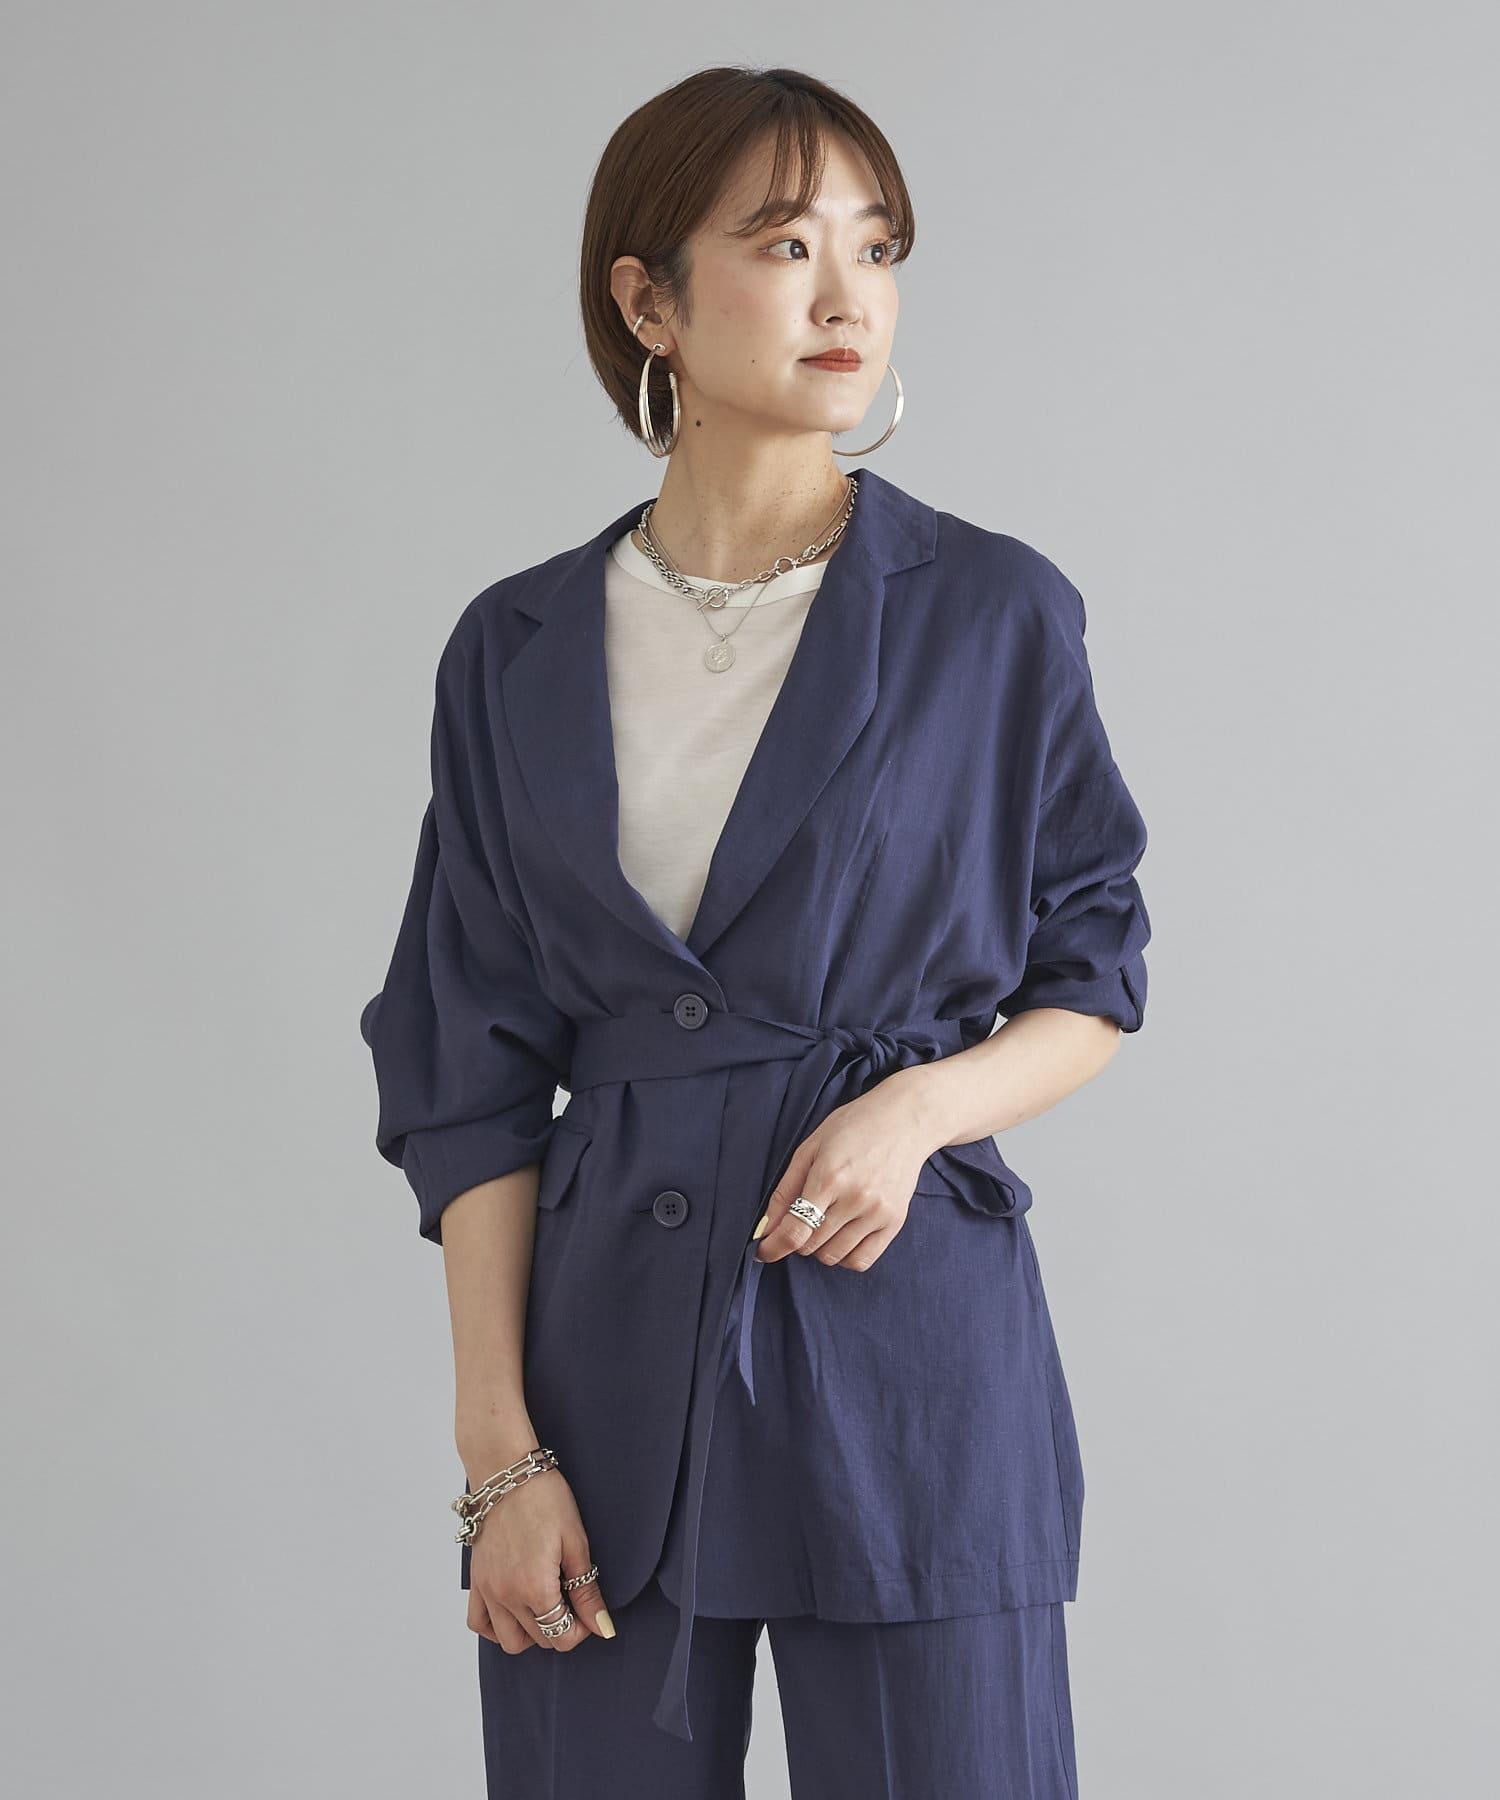 DOUDOU(ドゥドゥ) 【WEB限定】ジャケット+パンツ セットアップ